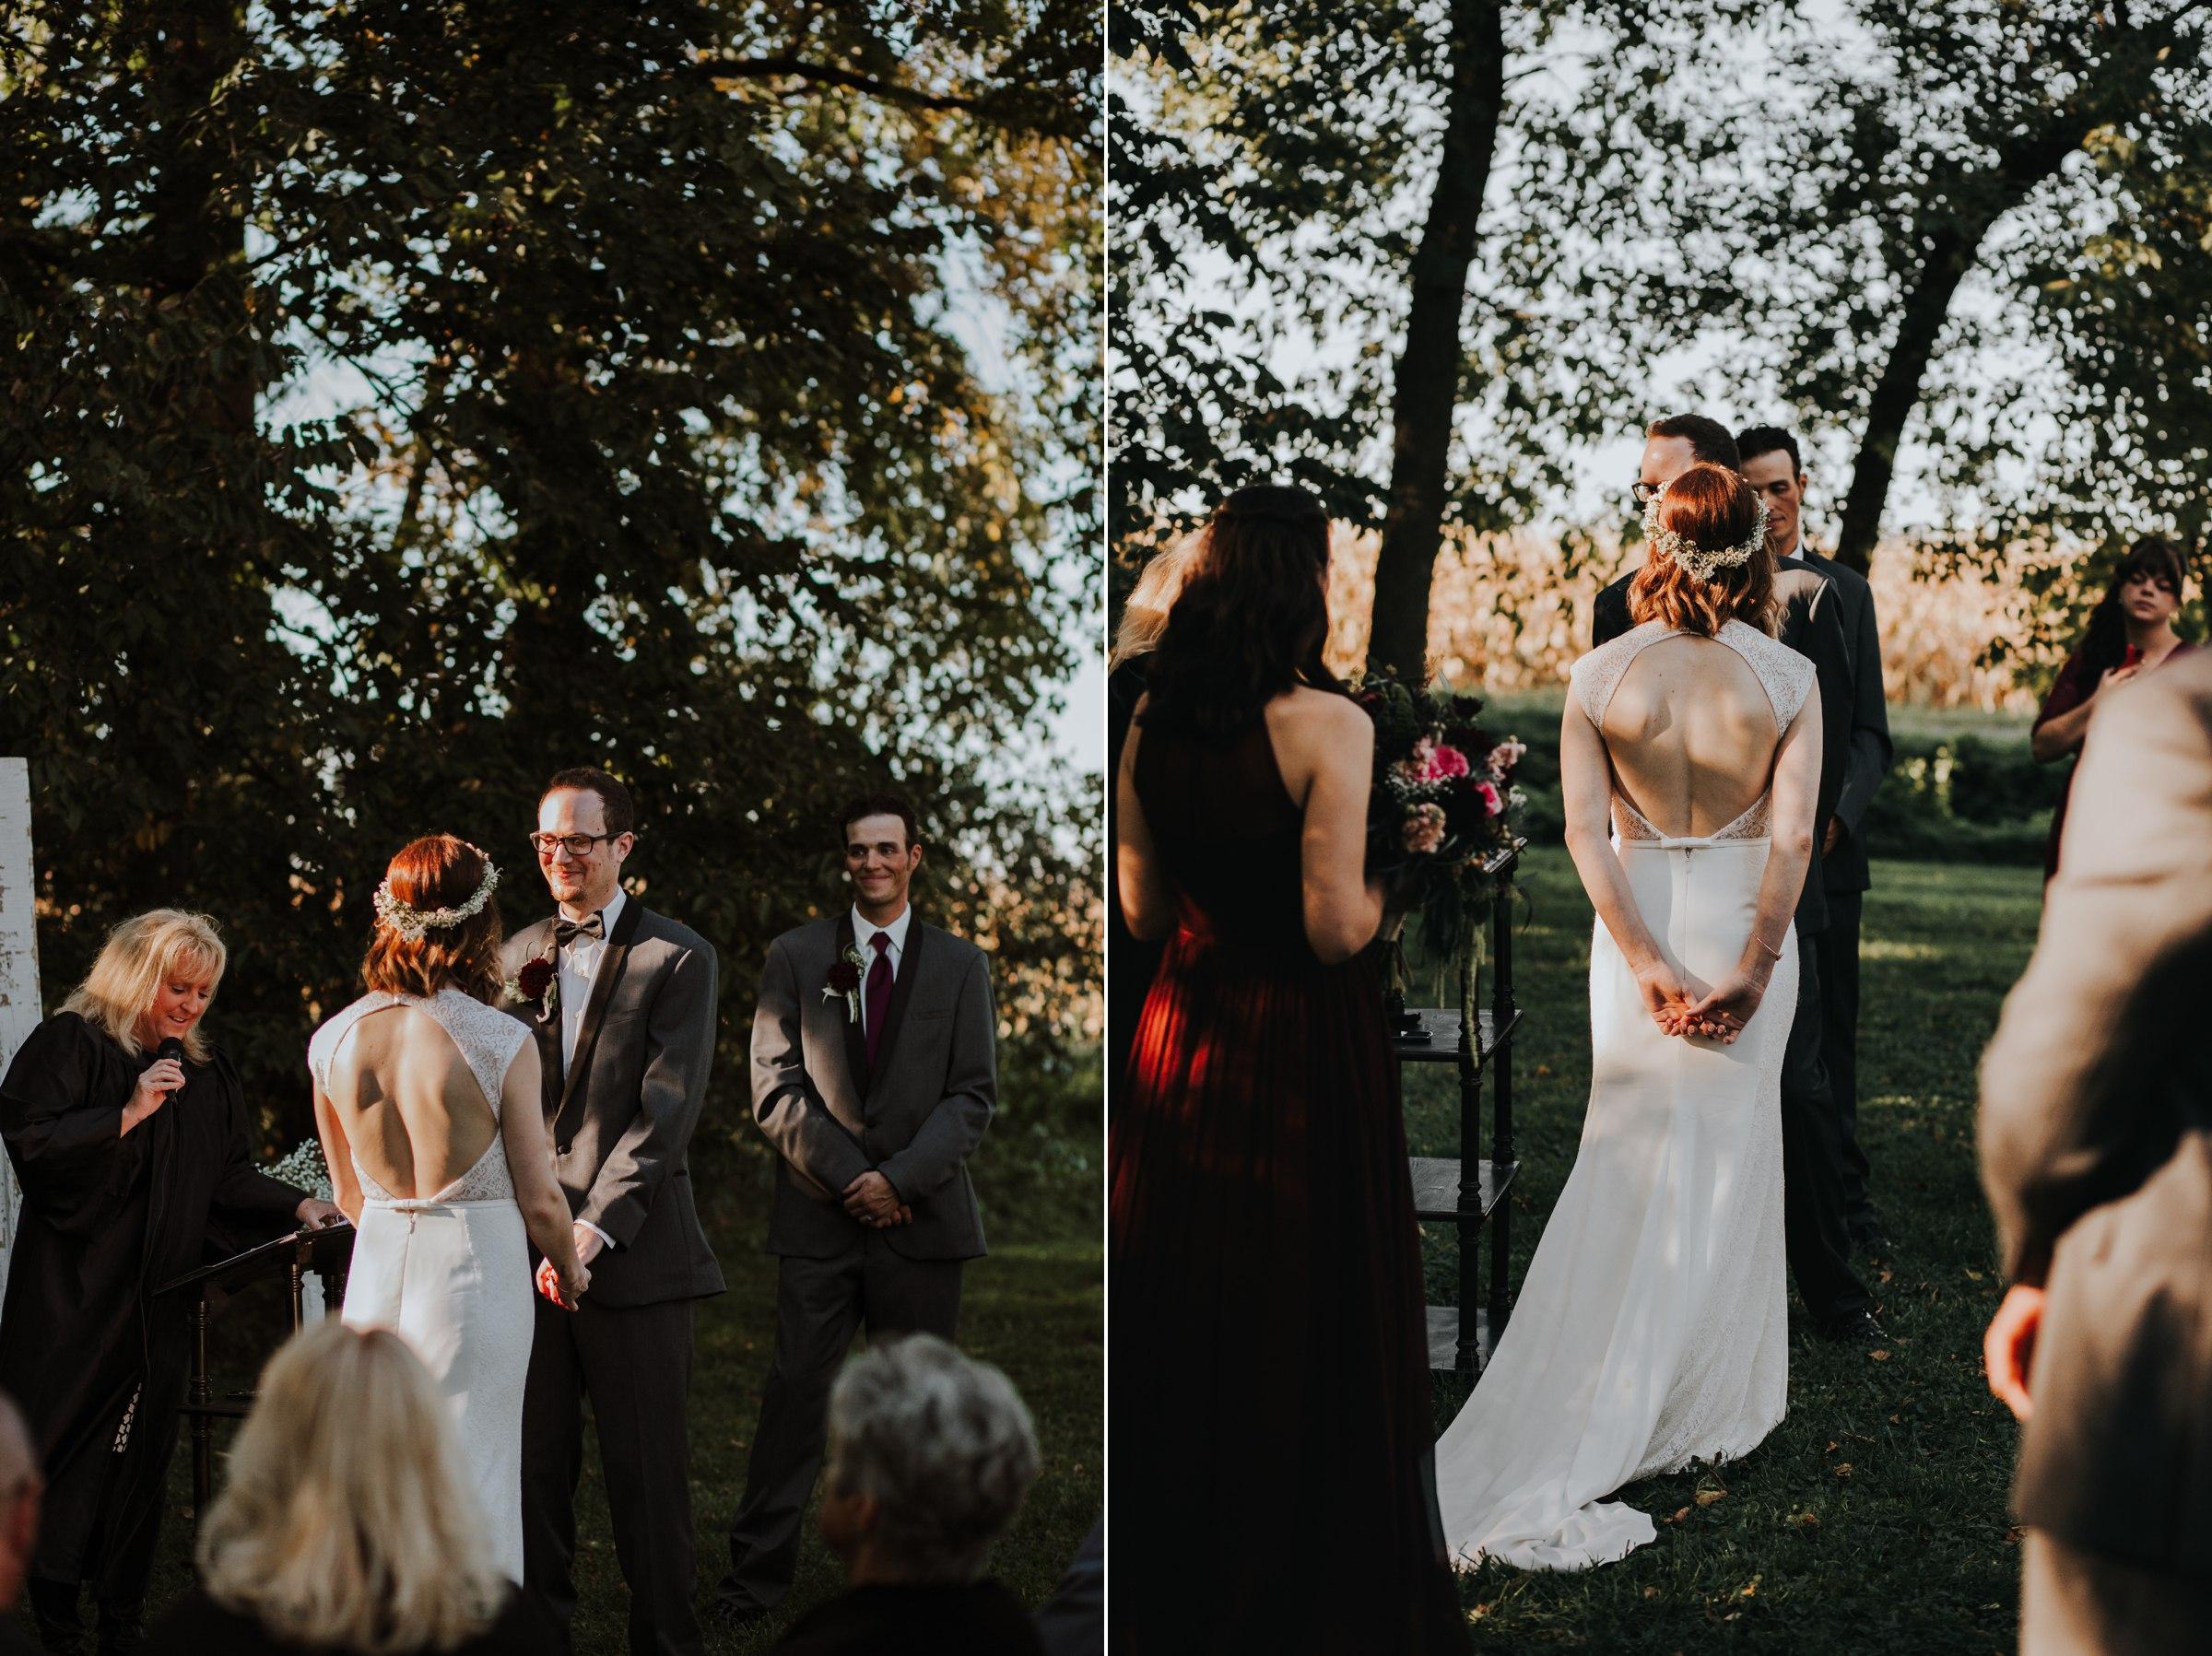 caroline and taylor minneapolis minnesota texas austin dallas houston wedding elopement destination intimate adventurous couple best photographer_0233.jpg